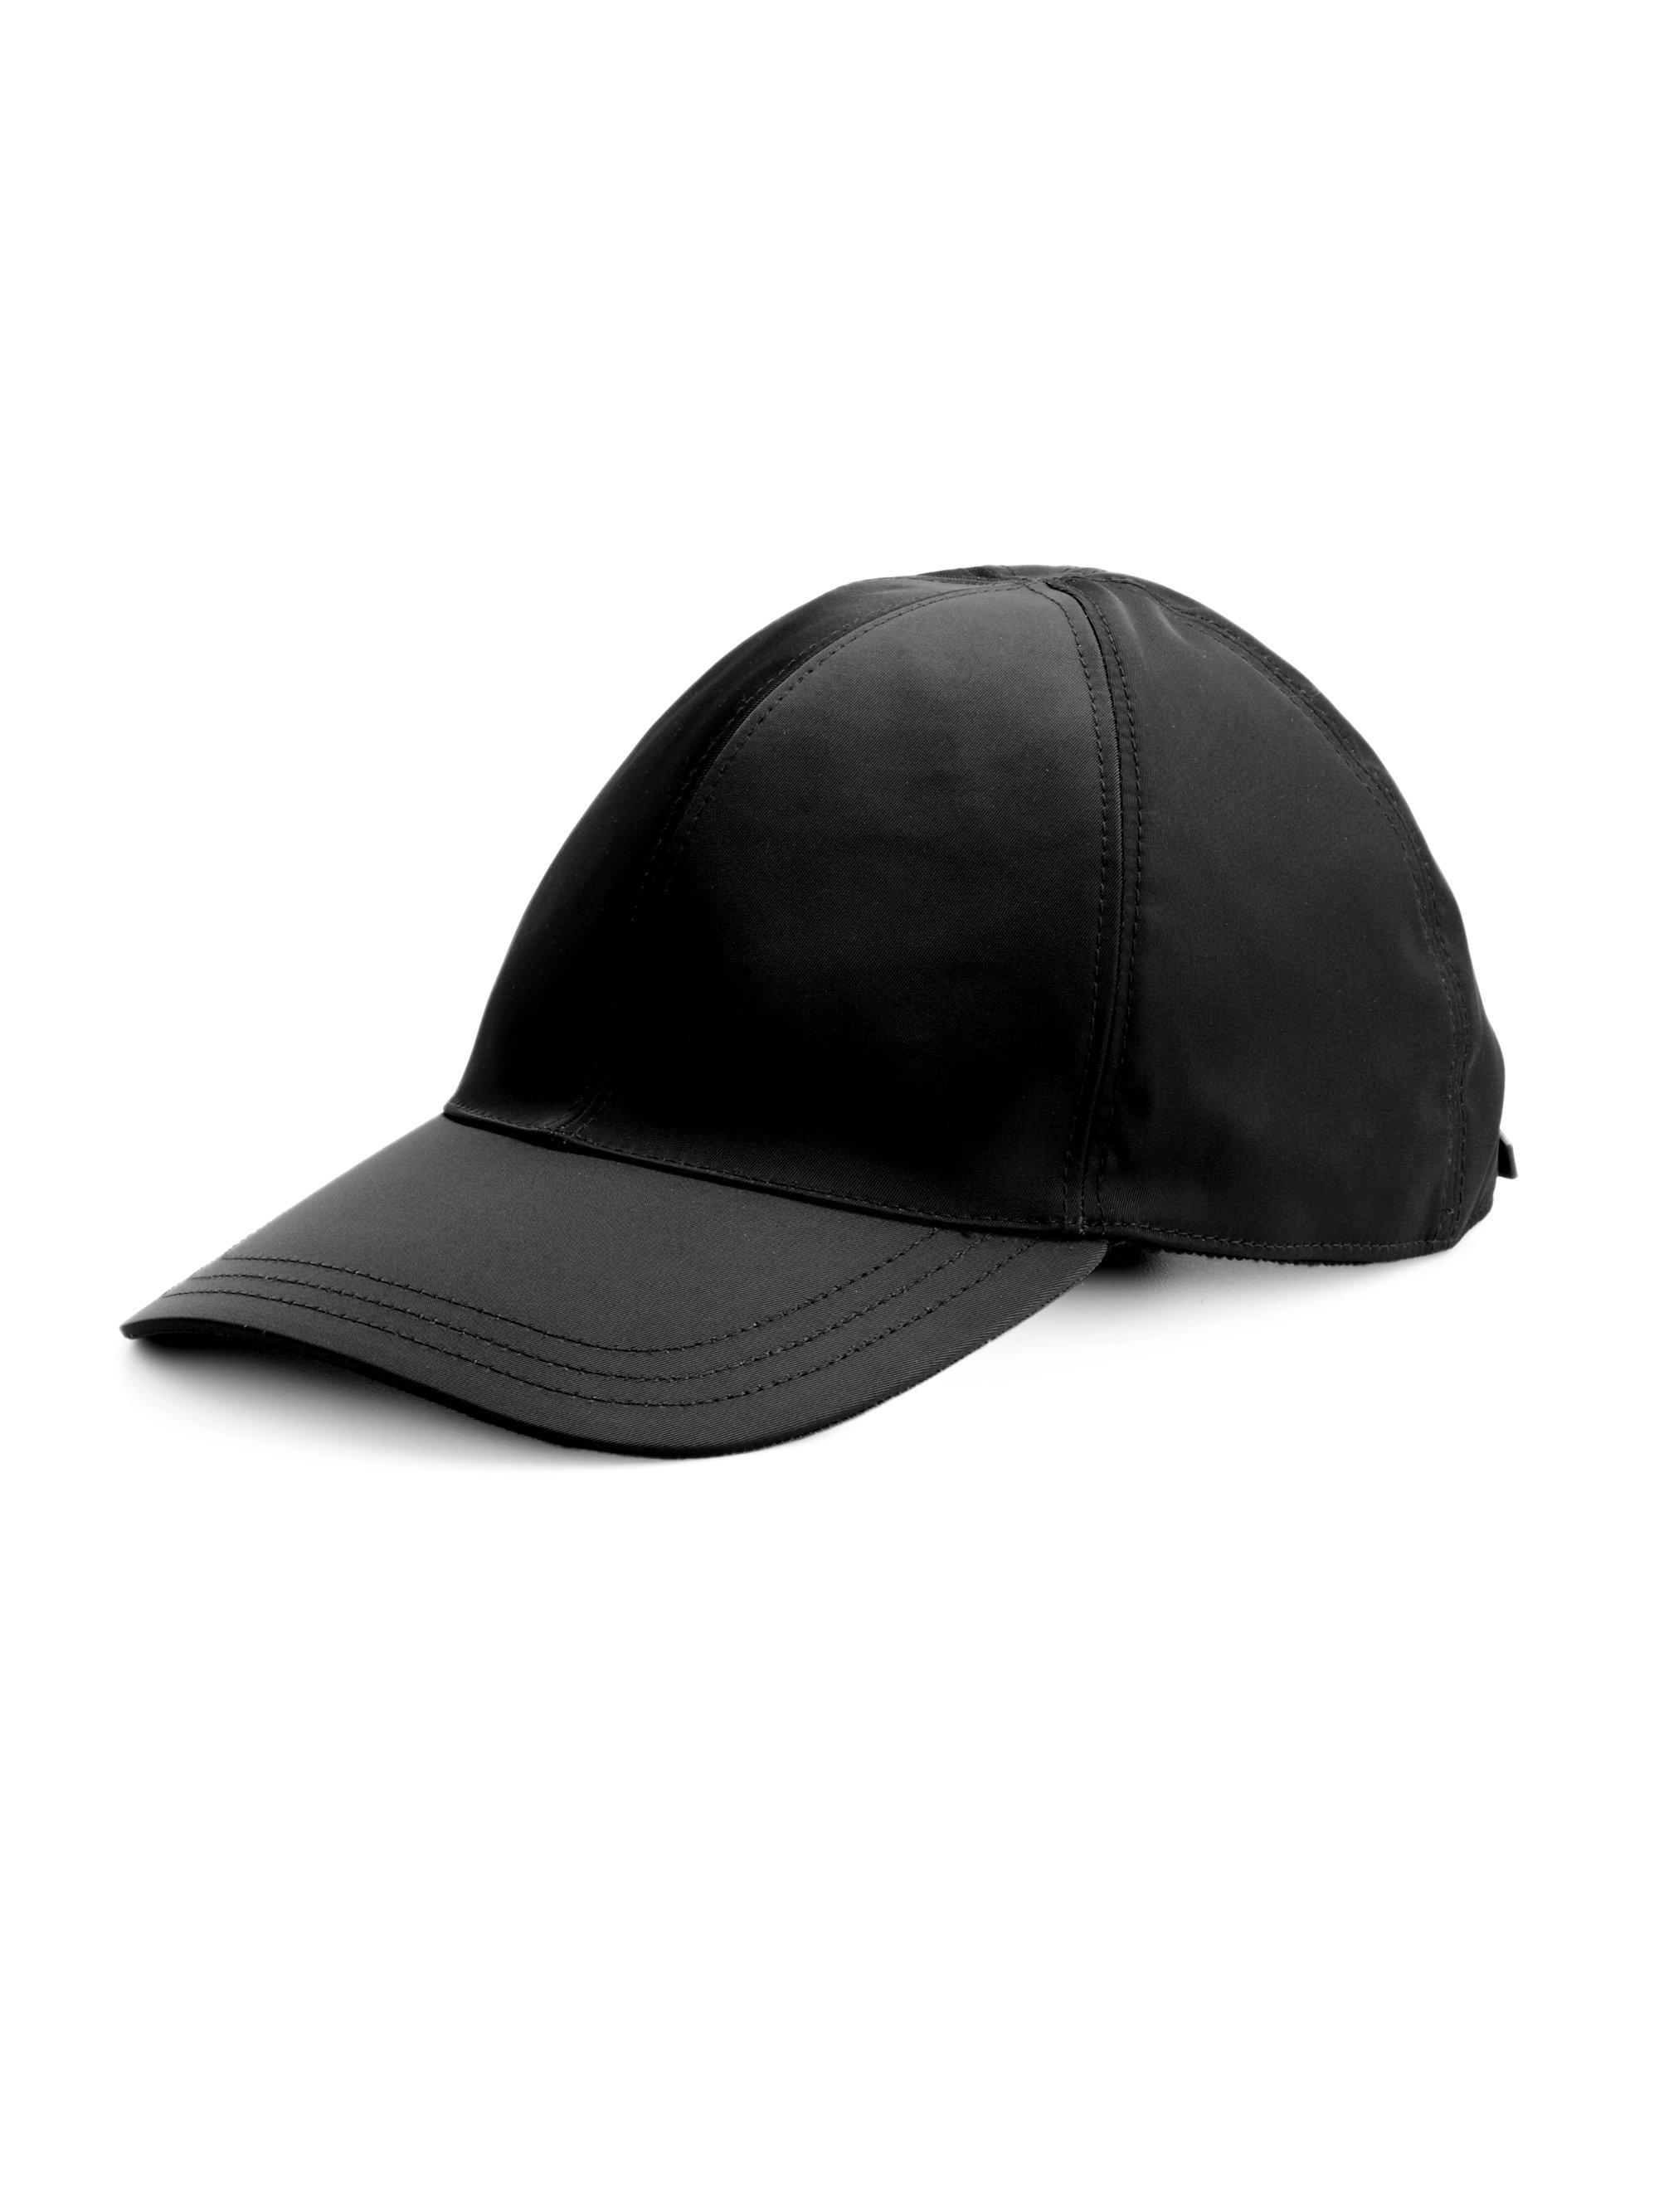 46849edbb Prada Nylon Baseball Cap in Black for Men - Lyst